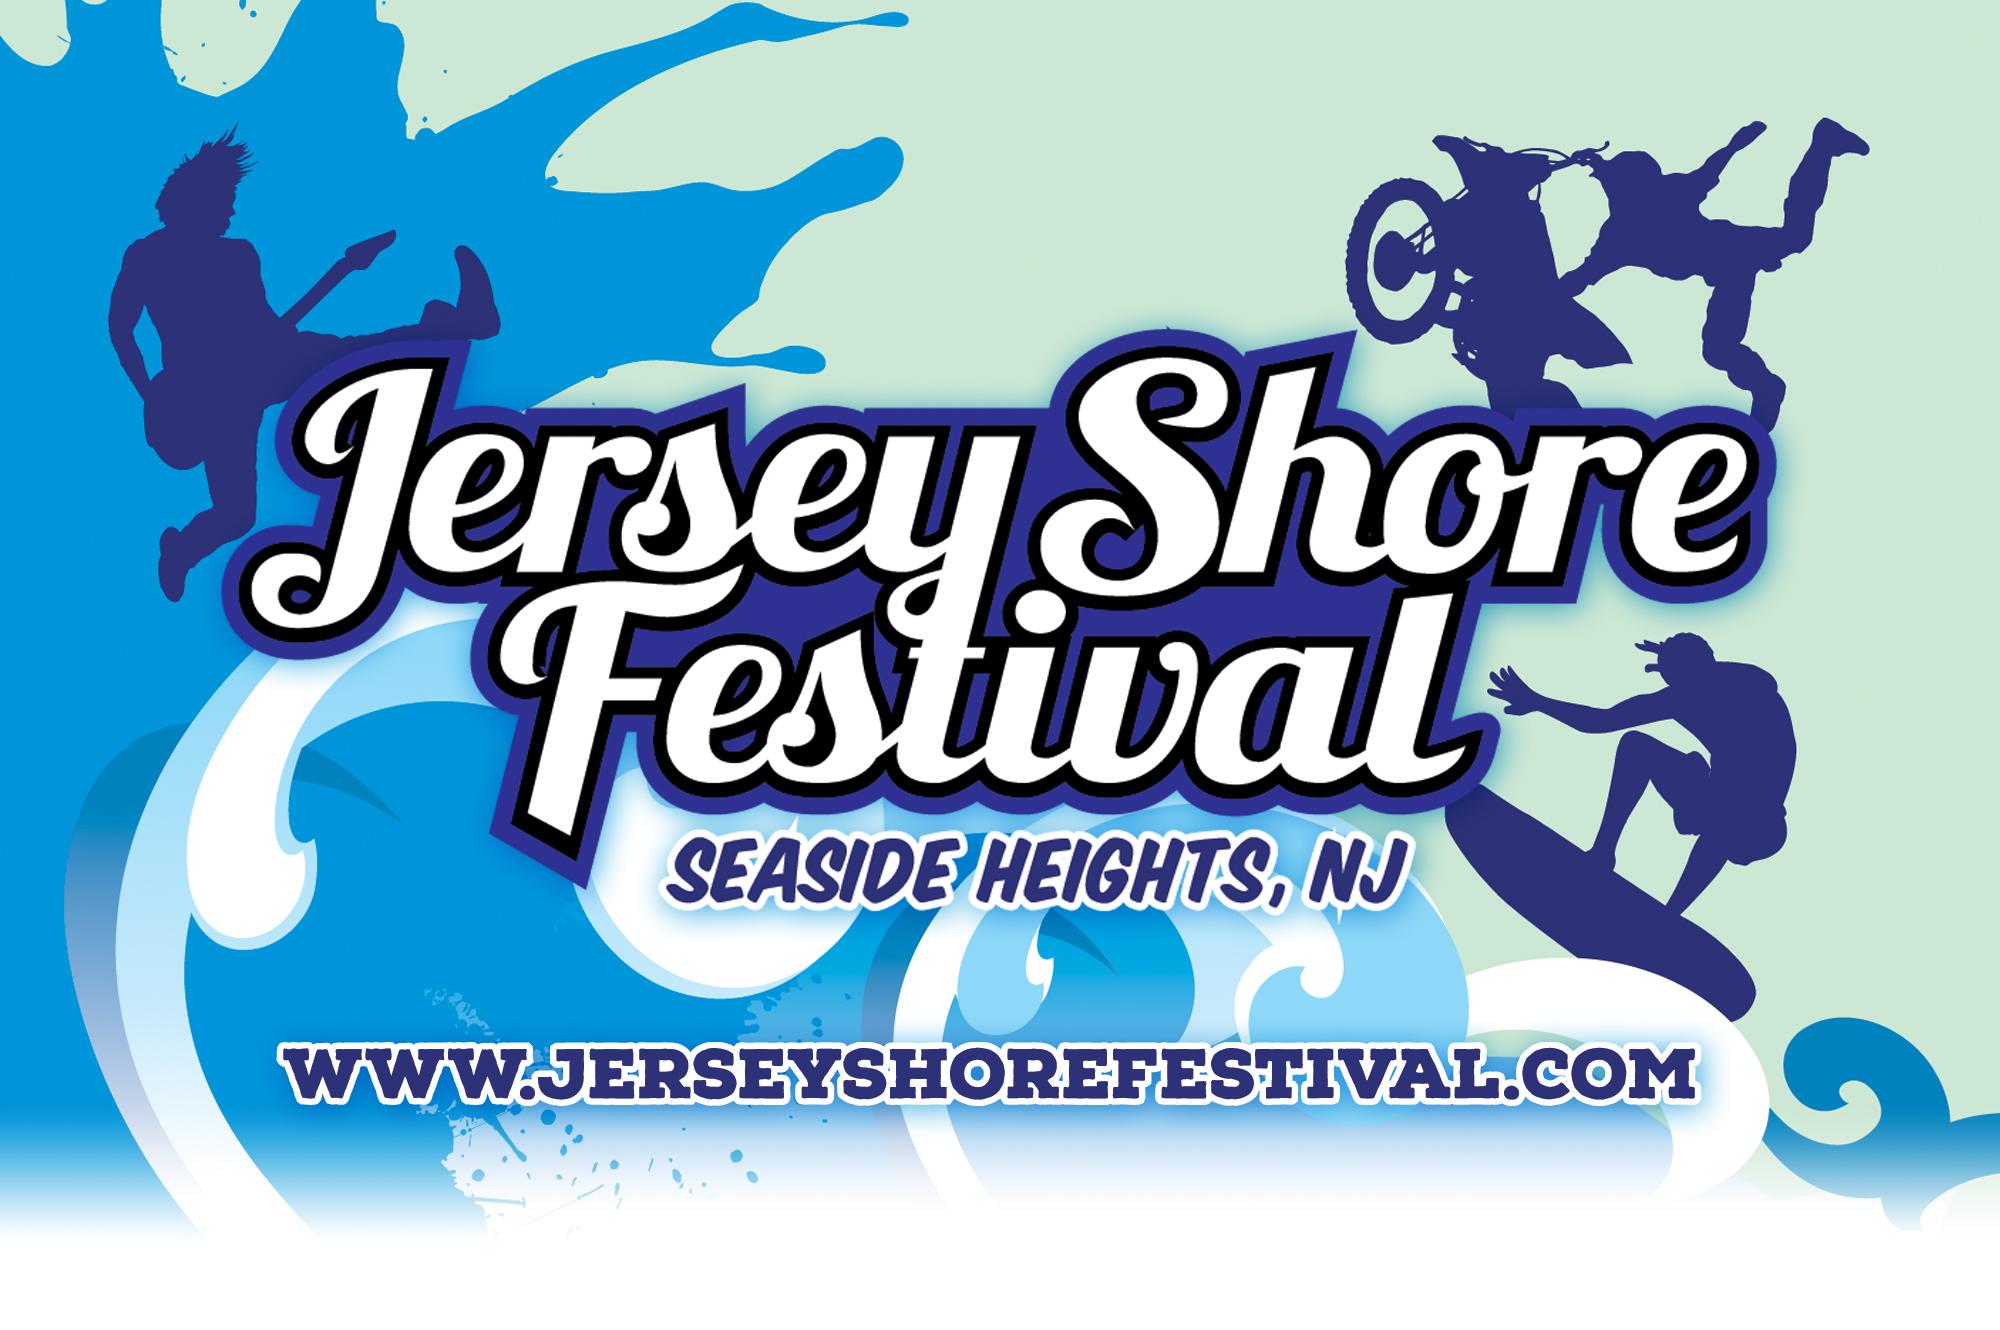 JerseyShore Festival